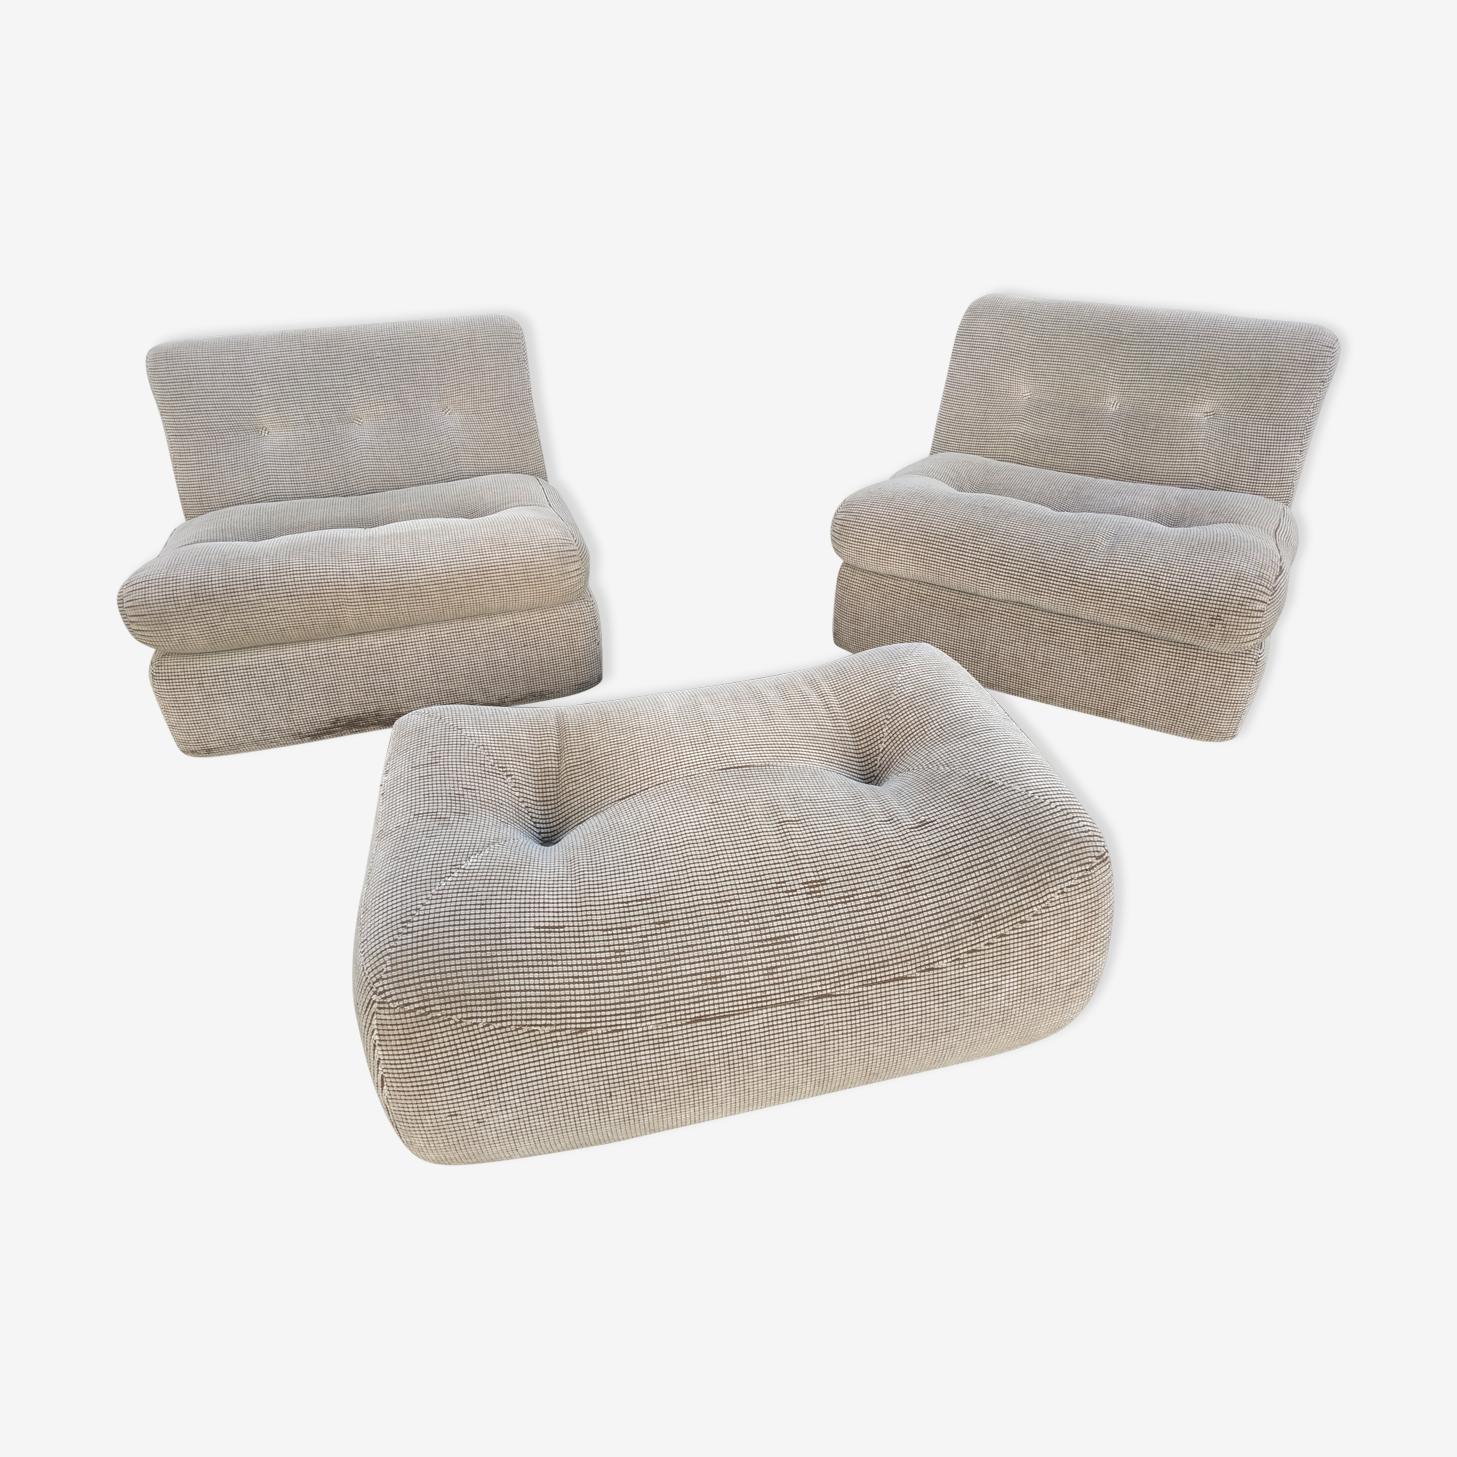 "Set fauteuils et ottoman Design B&B Mario Bellini ""Amanta"" 1970's"